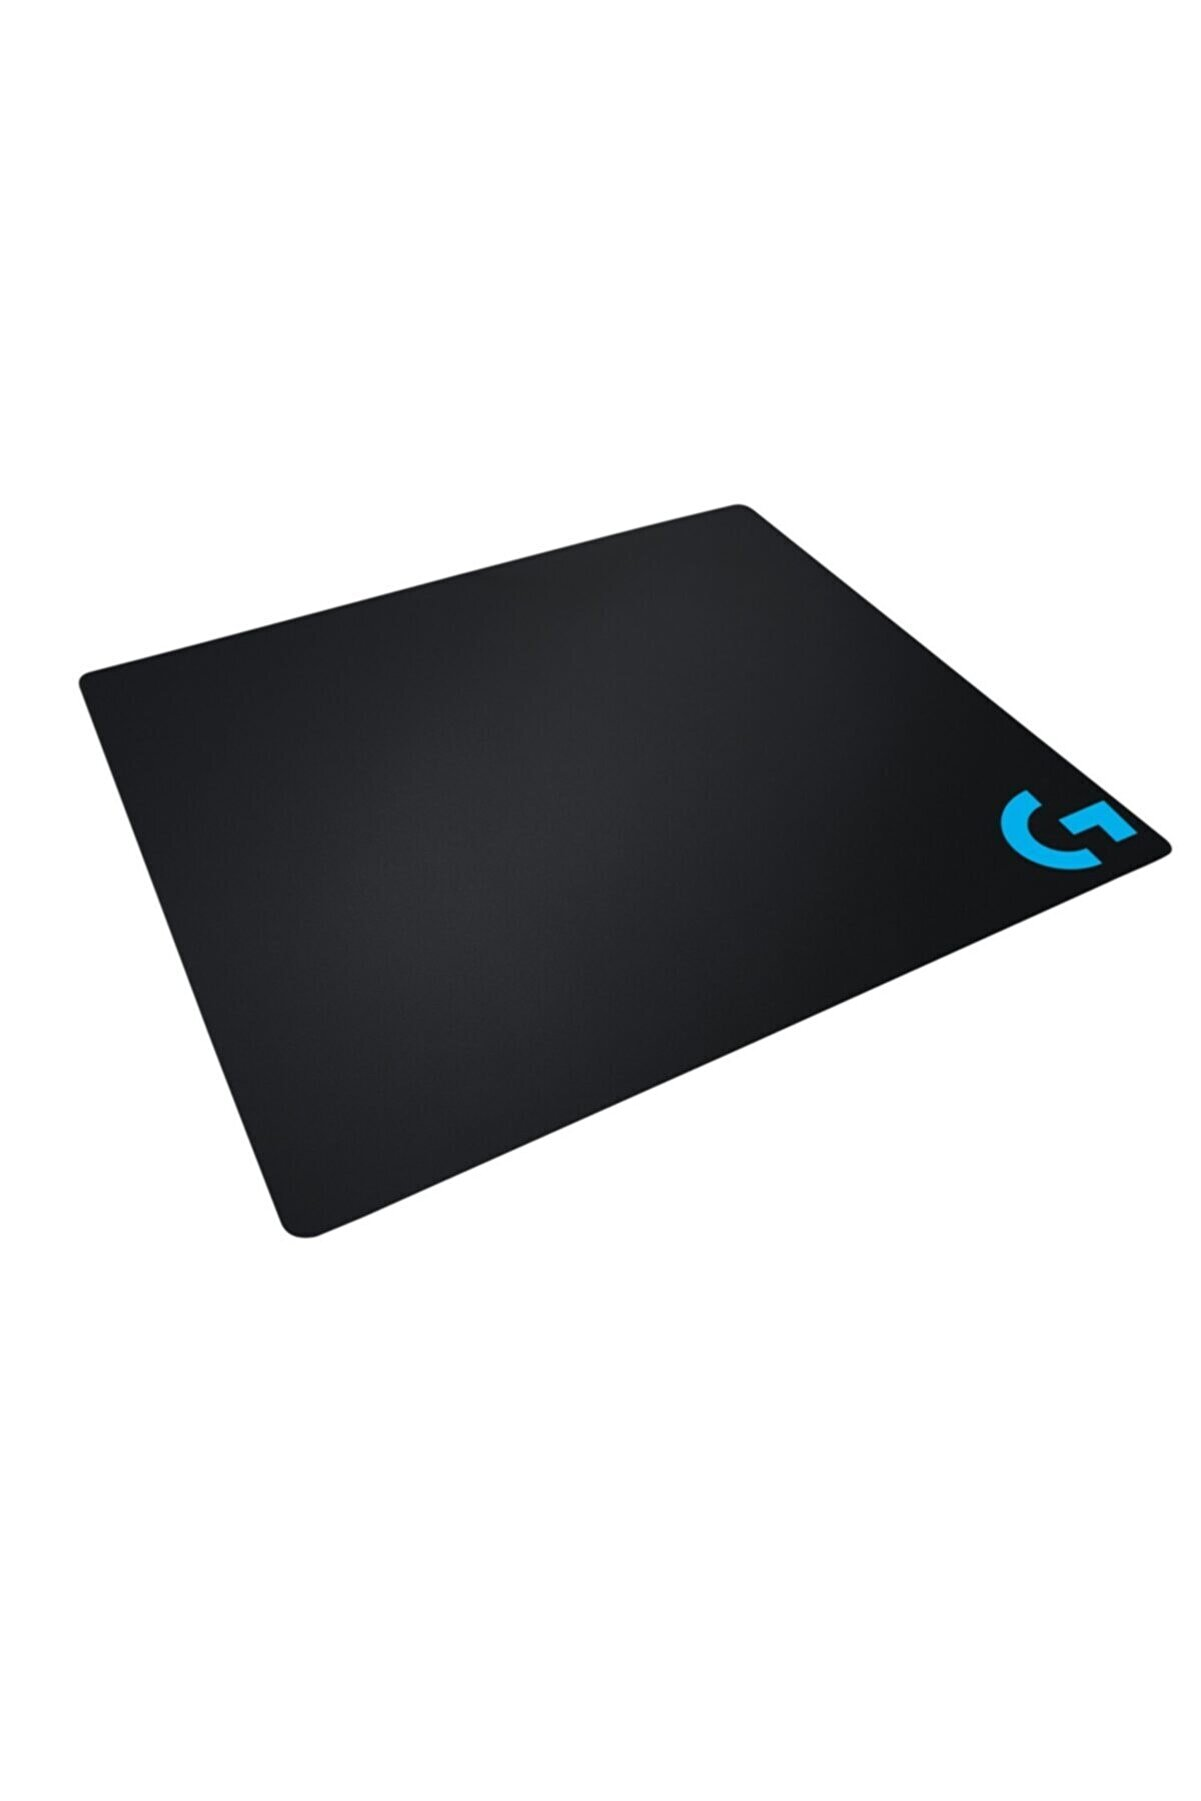 Lunatic Logitehc Oyuncu Mouse Pad 40 X 30 Cm (KUTULU)